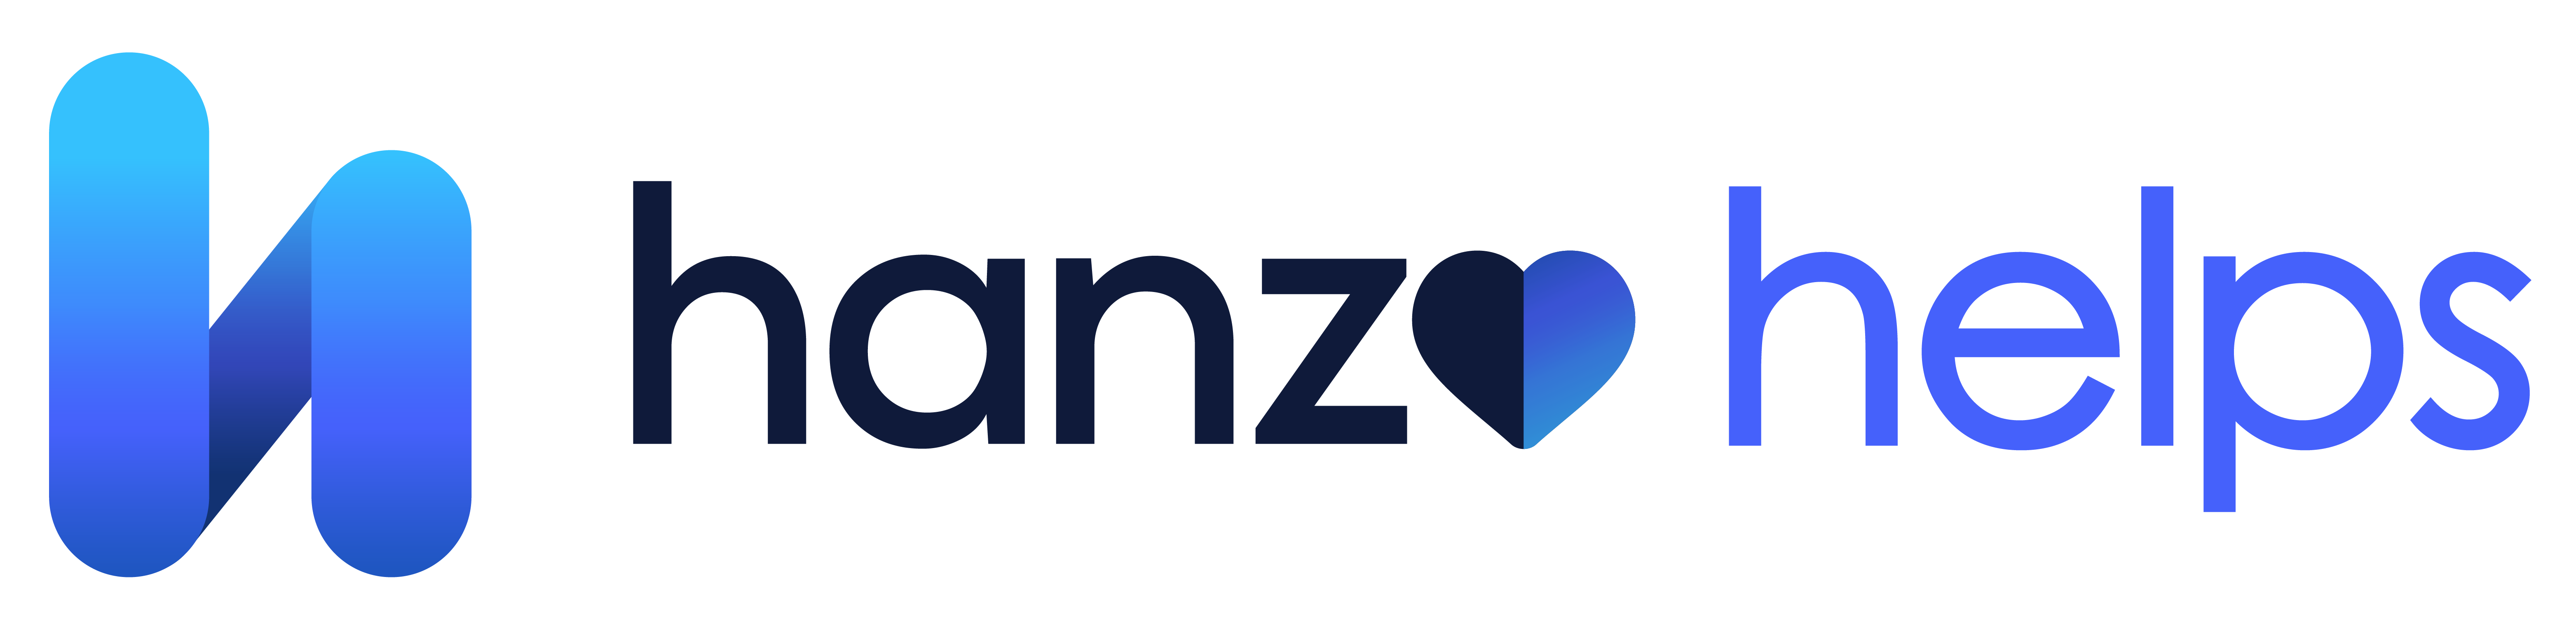 Hanzo-Helps-Heart-logo